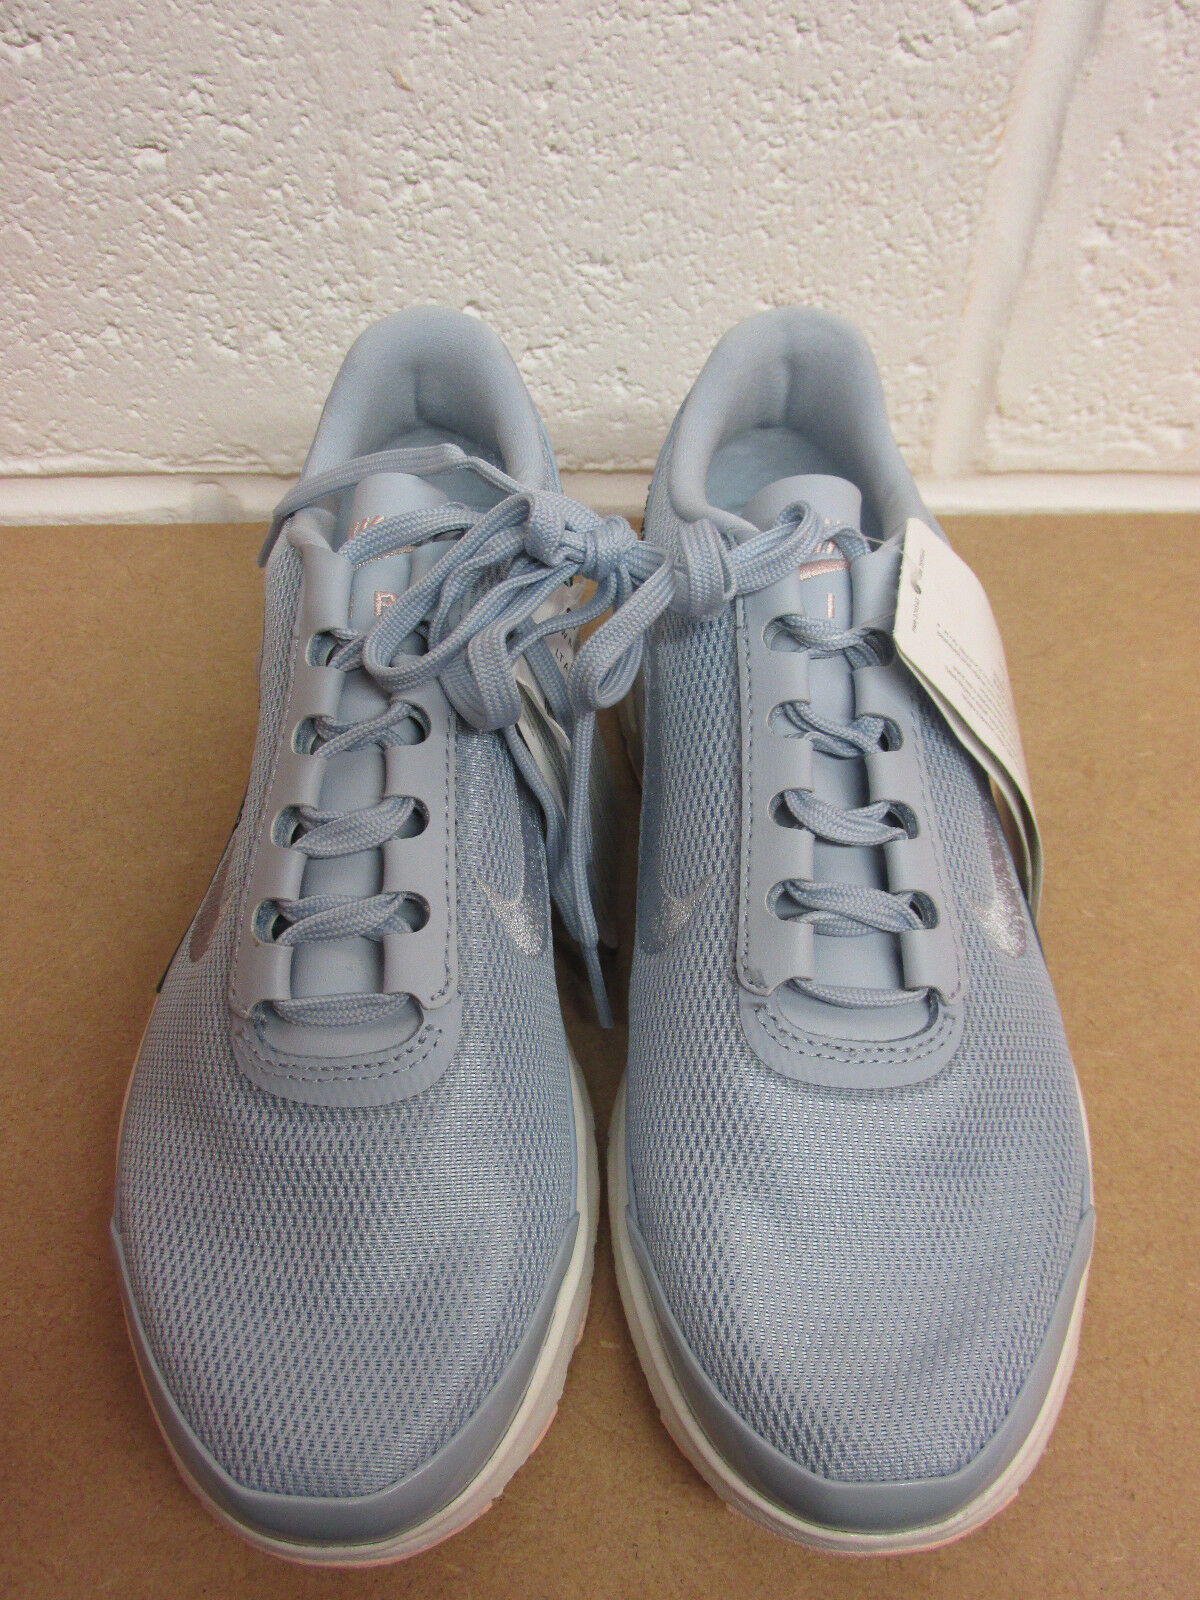 Nike Damenss air max jewell 917673 400 Damenss Nike trainers Turnschuhe schuhe SAMPLE 090f7a